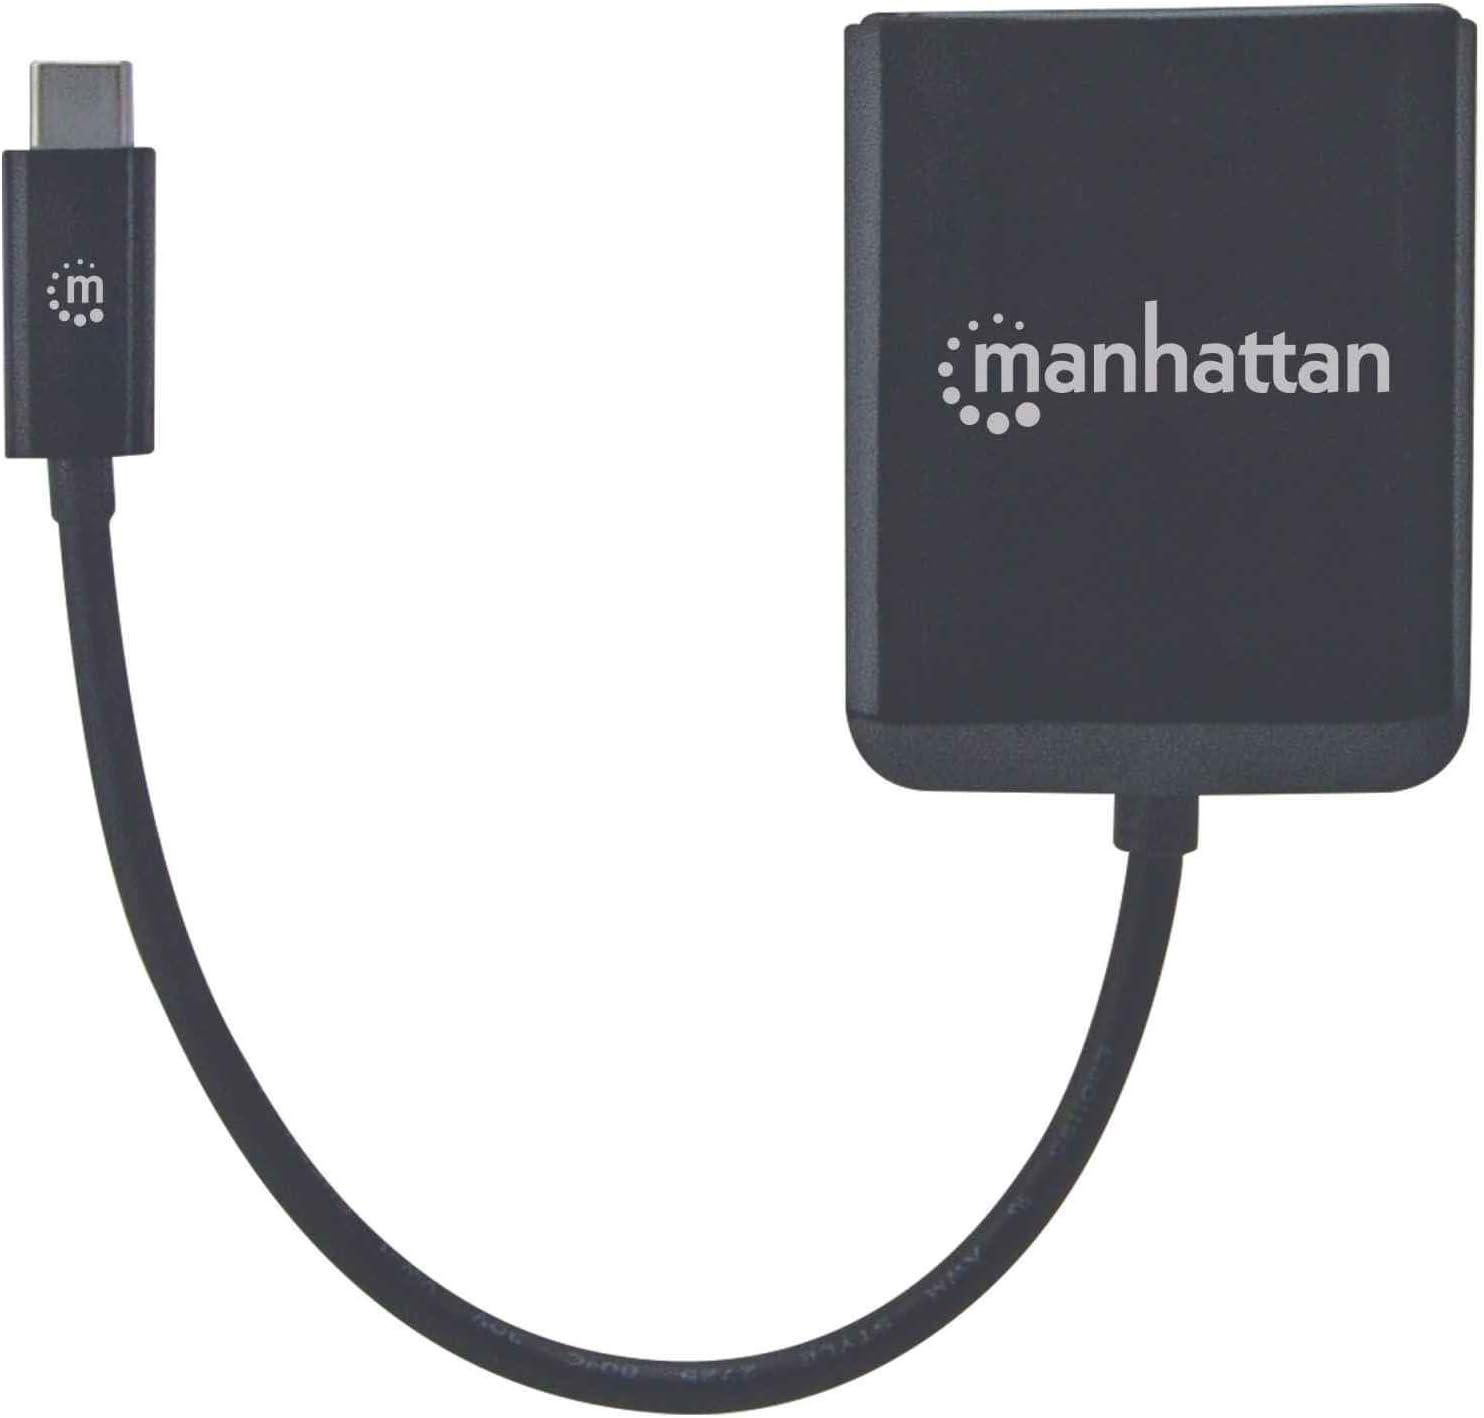 Manhattan USB-C to 2.5GBASE-T Gigabit 10//100//1000 Mbps and 2.5 Gbps Black RJ45 Network Adapter Multi-Gigabit Ethernet